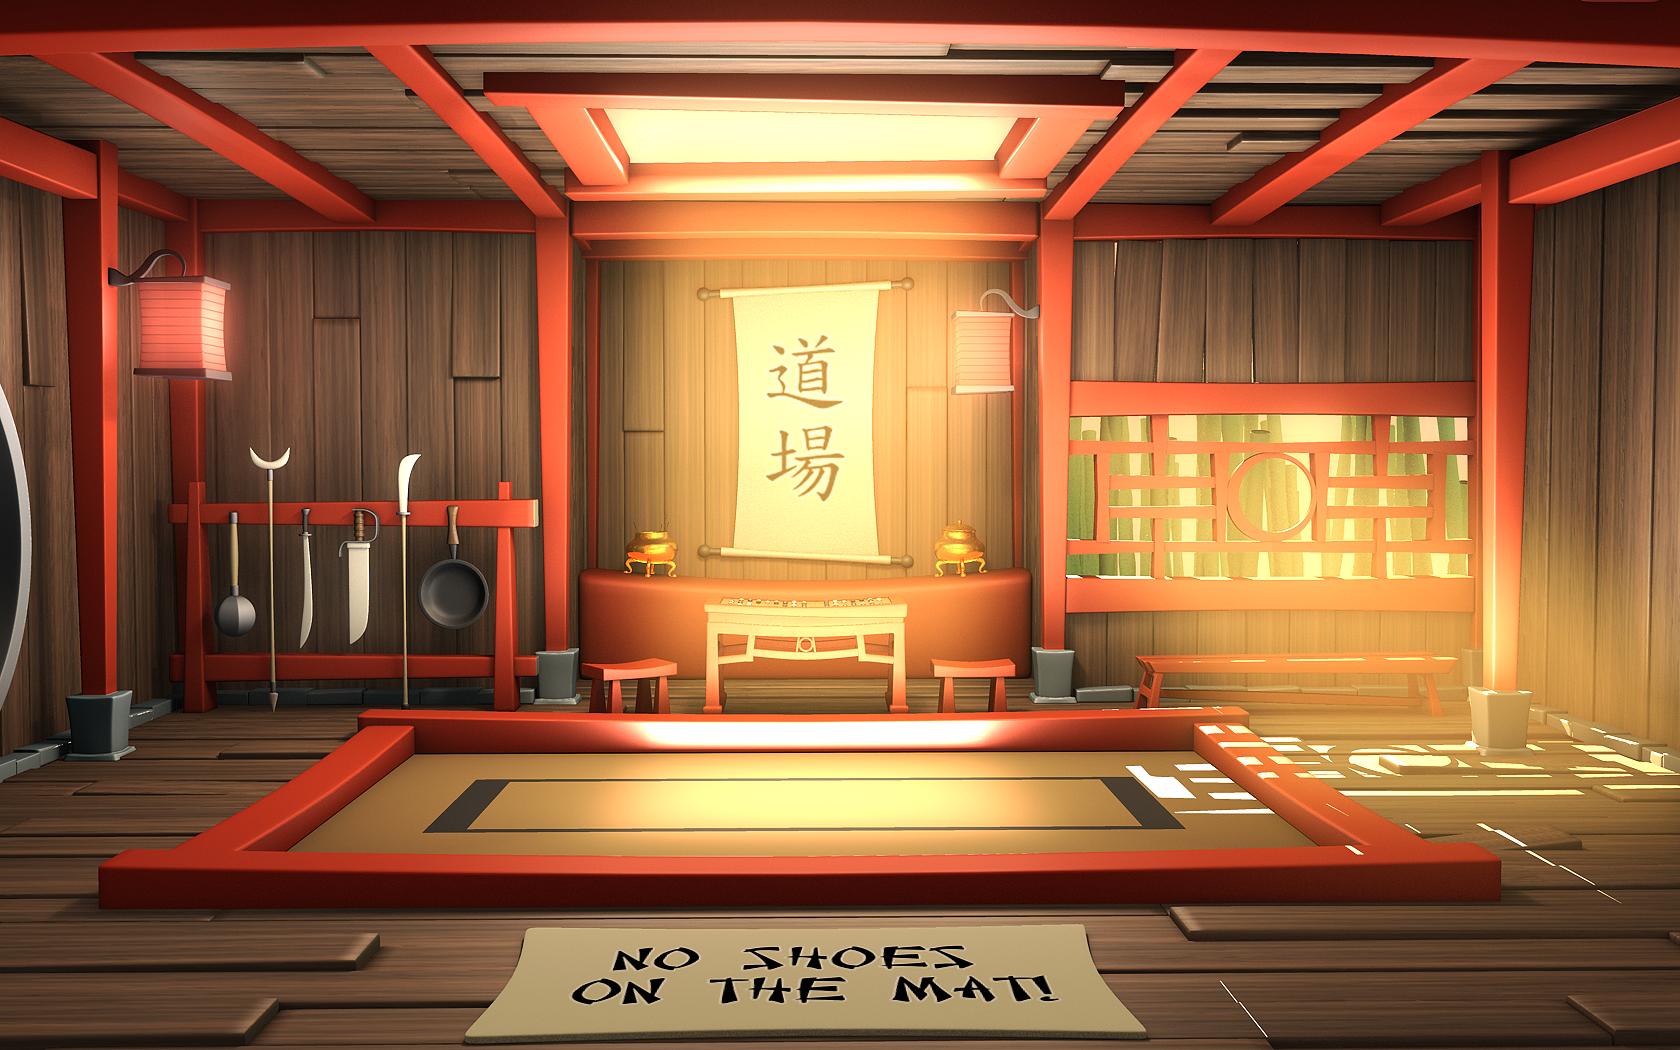 Cartoon Kung Fu Hall By Hayden Zammit Deviantart Com On